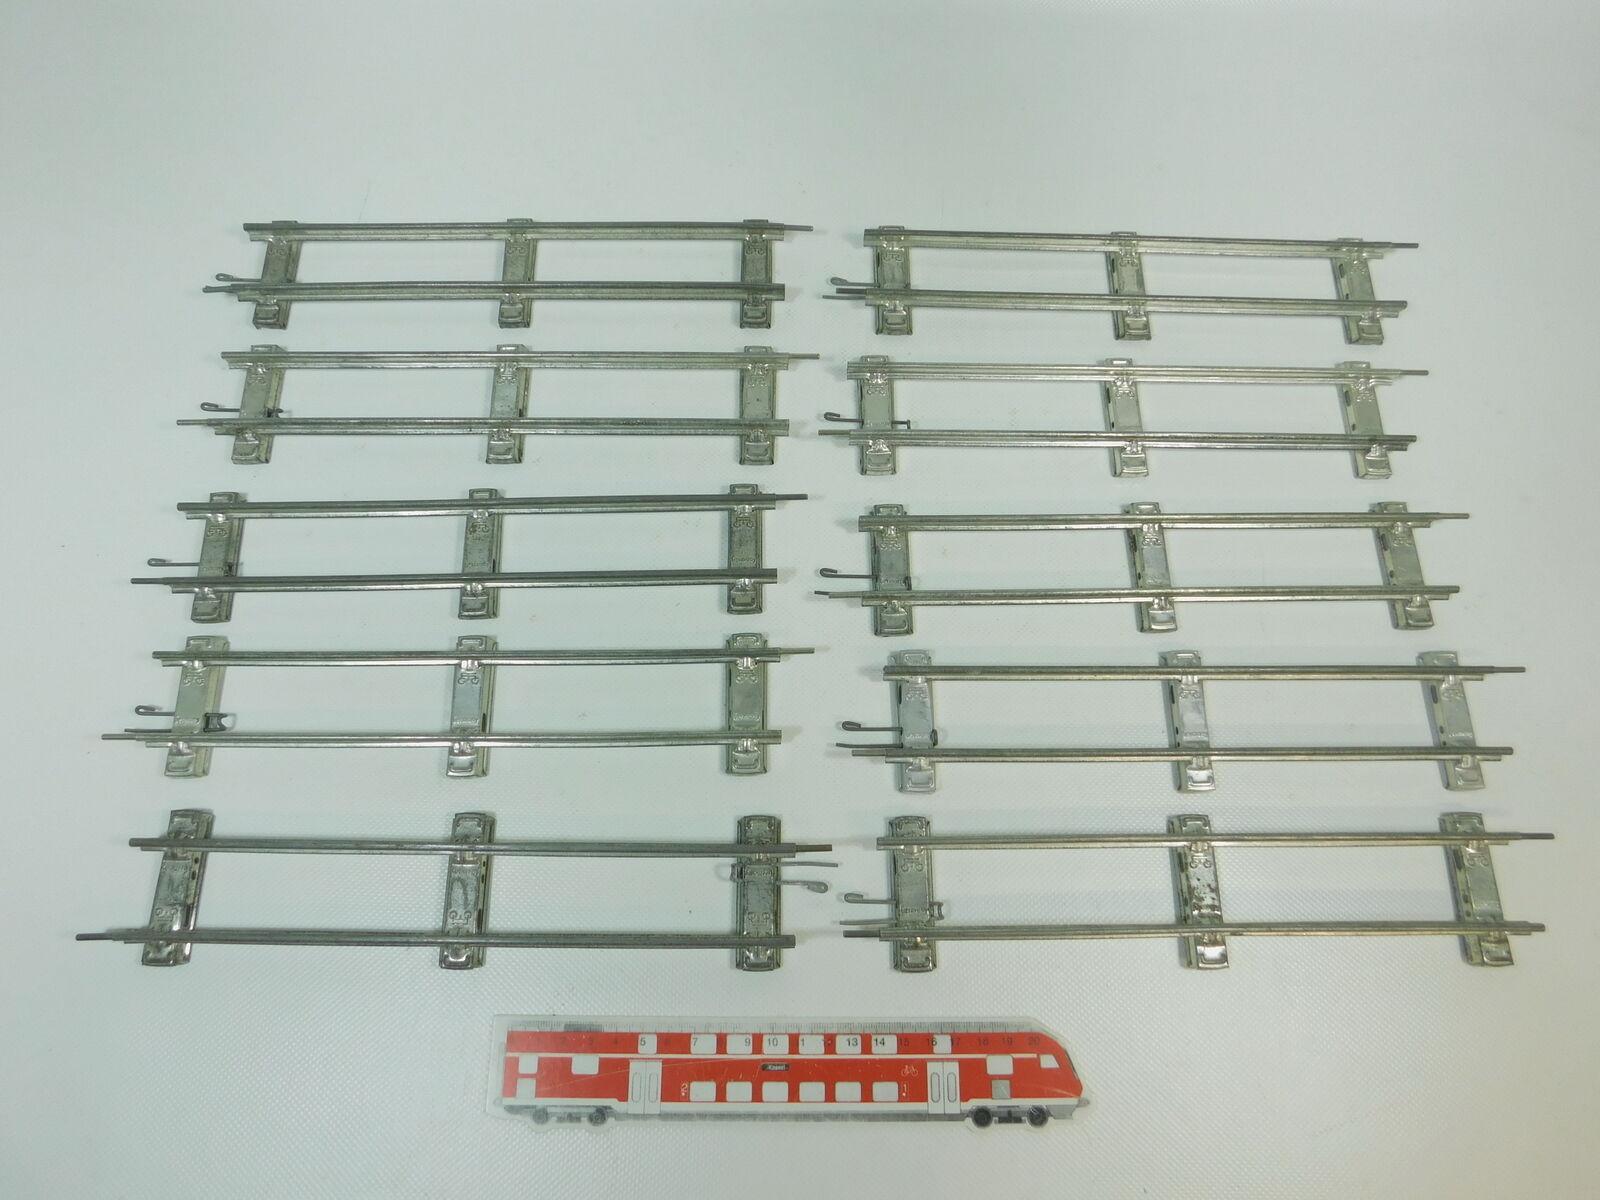 BK316-1  10x Märklin Spur 0 Gleis Gleisstück gerade (26 cm) für Uhrwerk-Betrieb